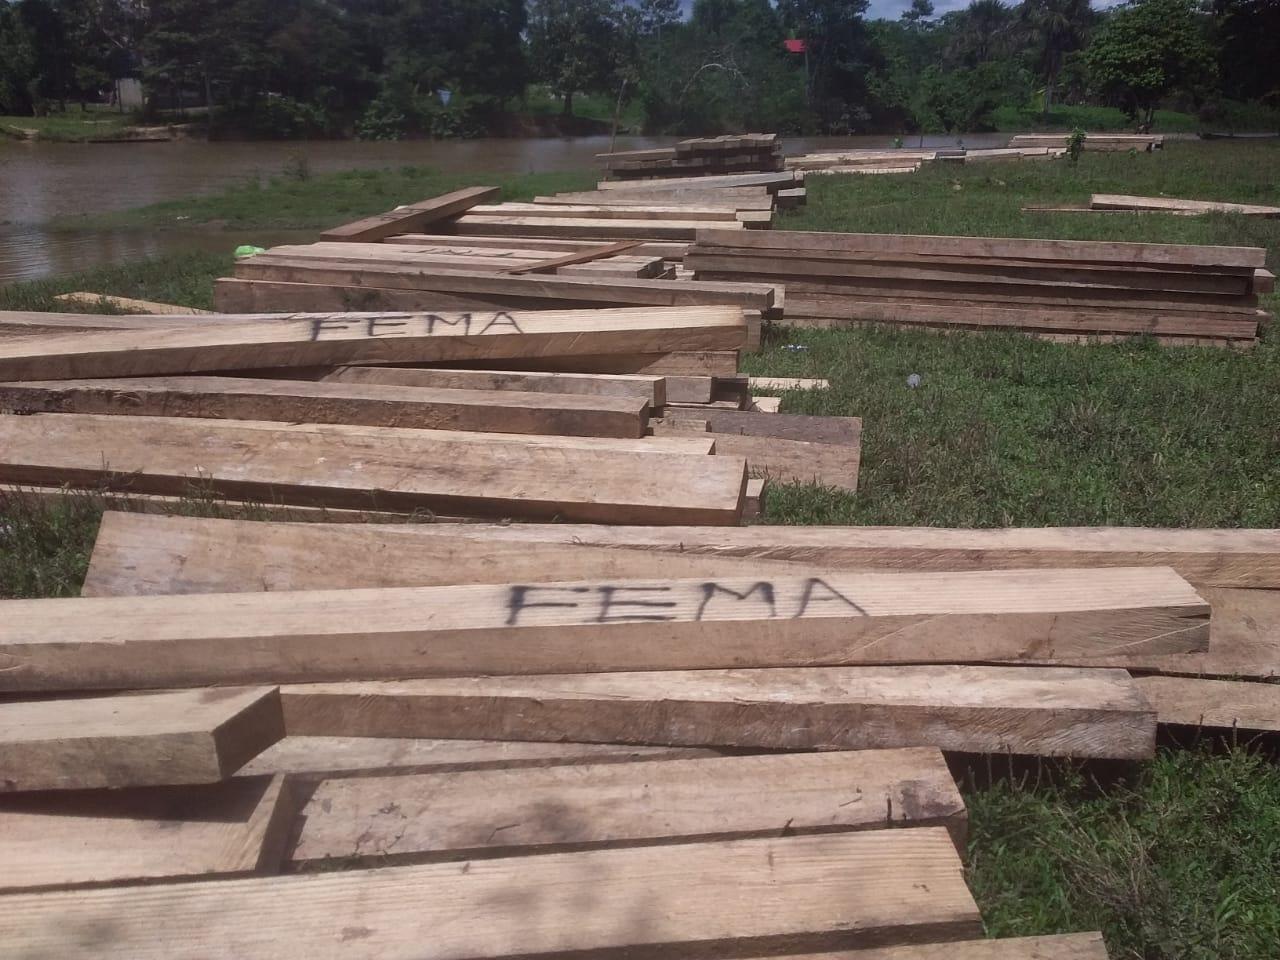 33 m3 of Cumala, Cupaiba, and Lupuna lumber seized in San Juan de Zapote